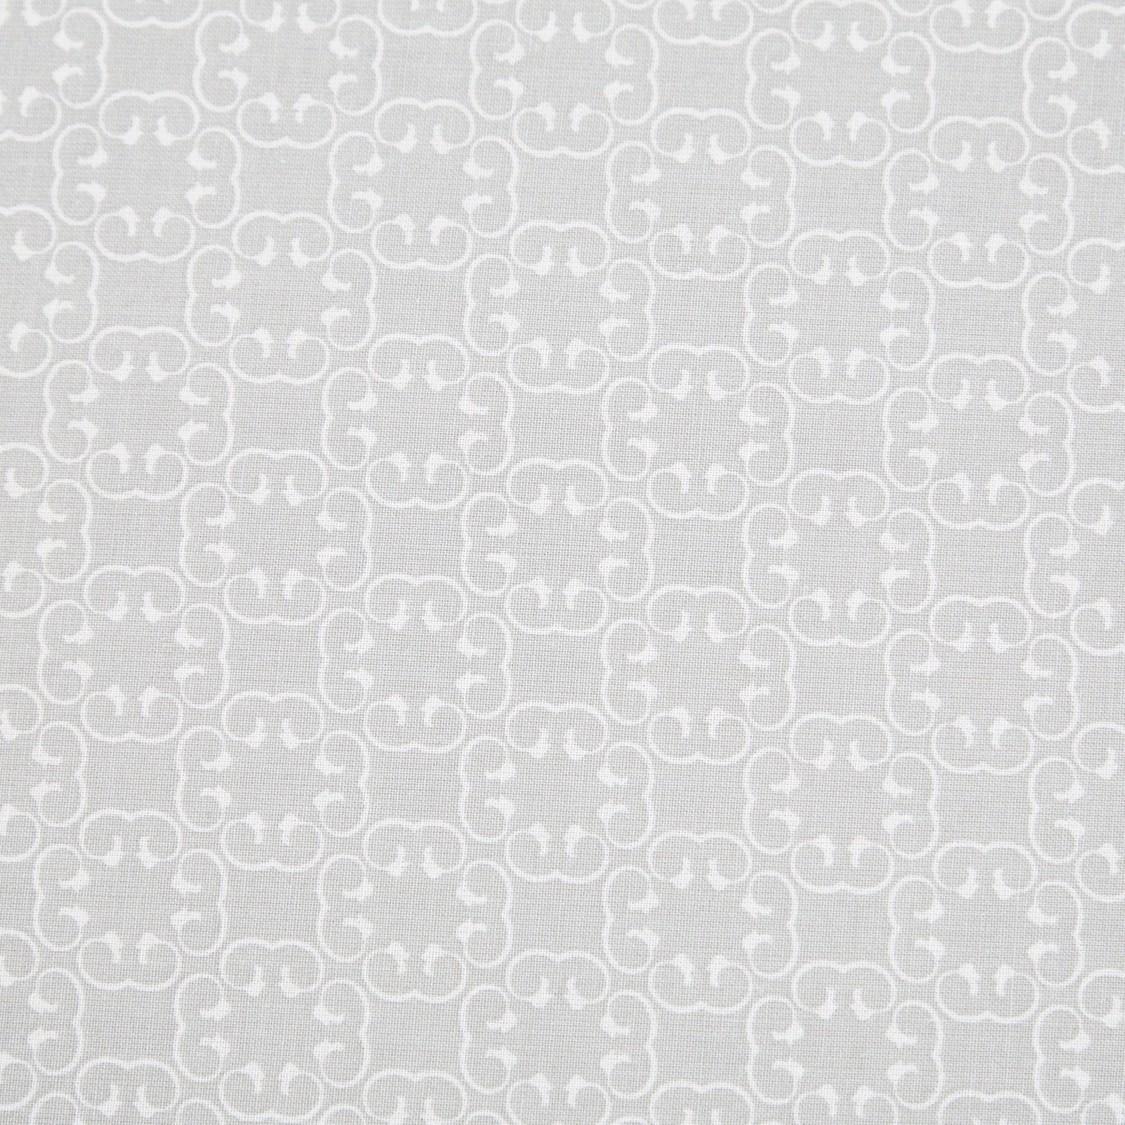 Printed 3-Piece Single Bedding Set - 200x90 cms